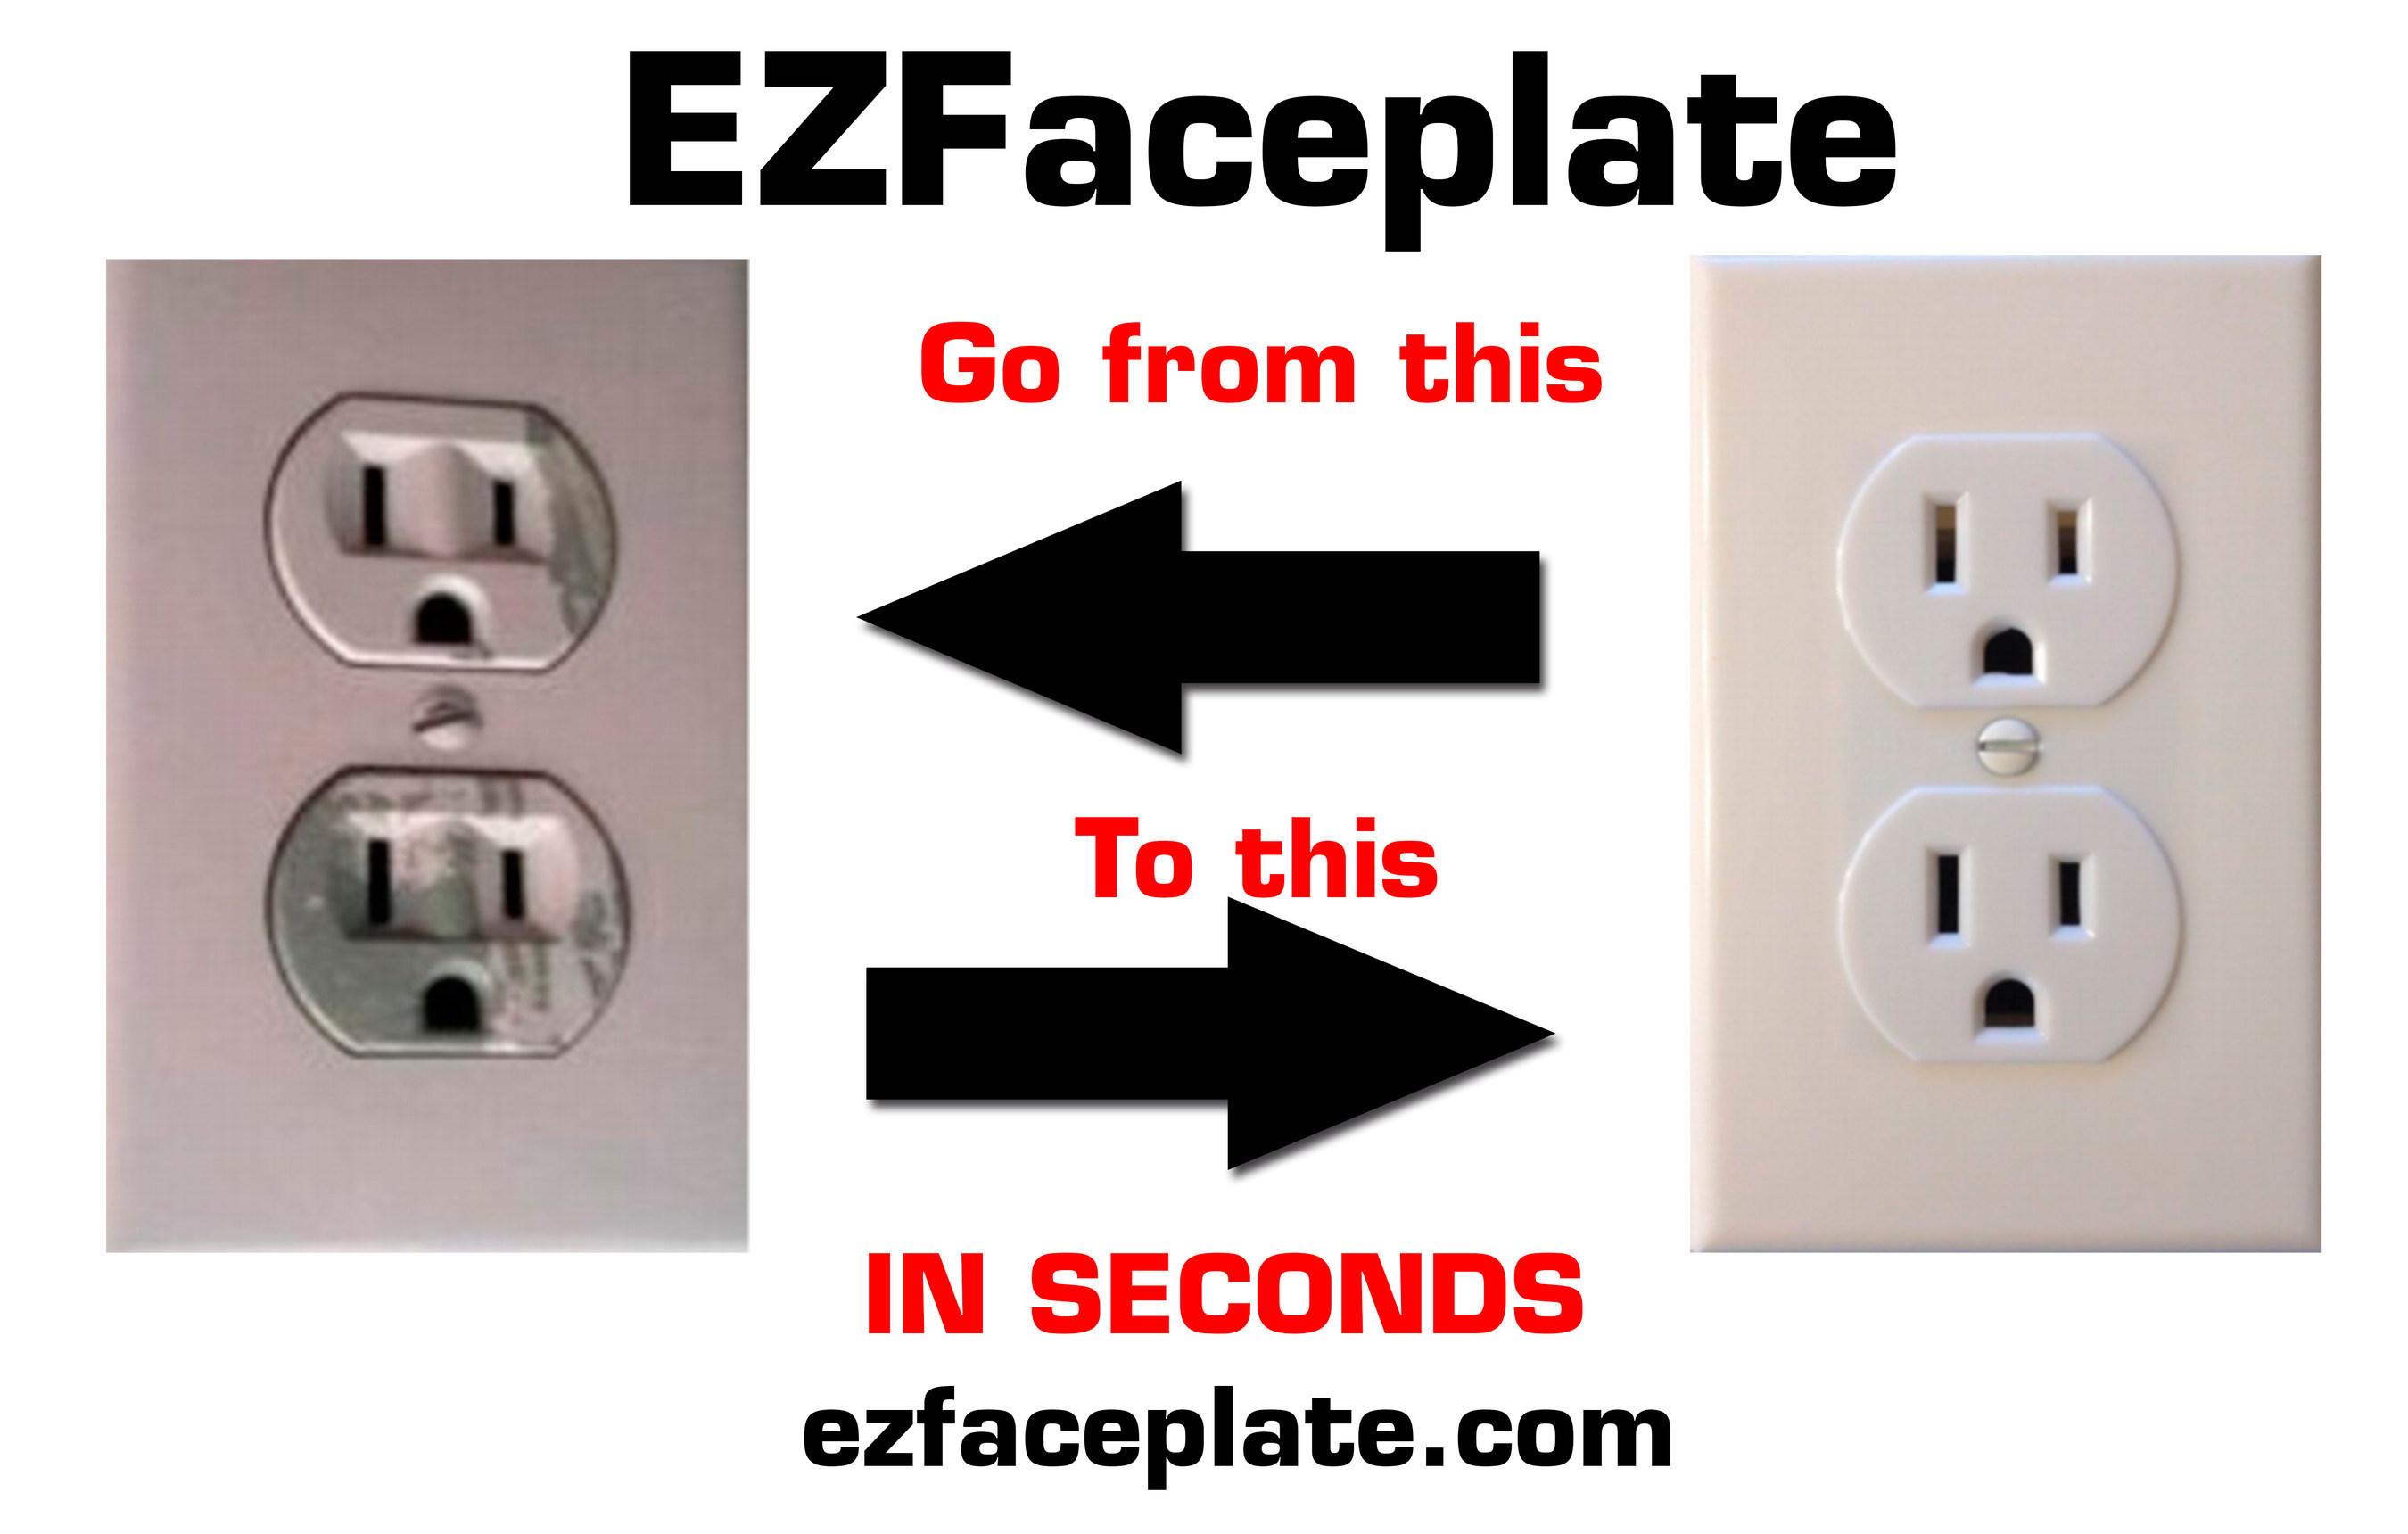 EZFaceplate - Don't replace, EZFace